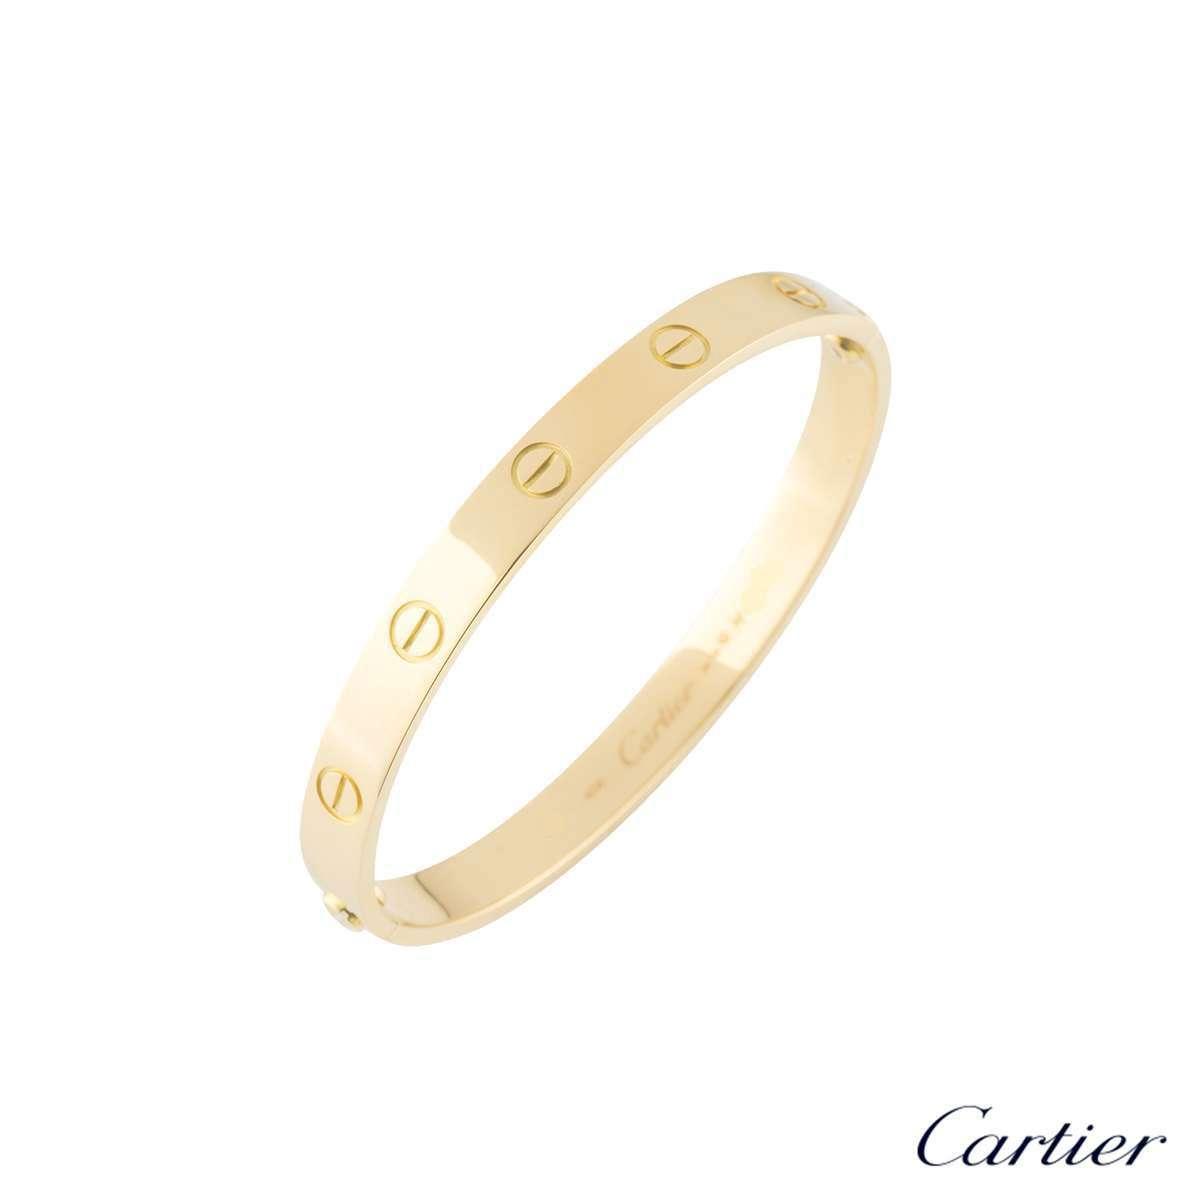 Cartier Yellow Gold Plain Love Bracelet Size 19B6035519